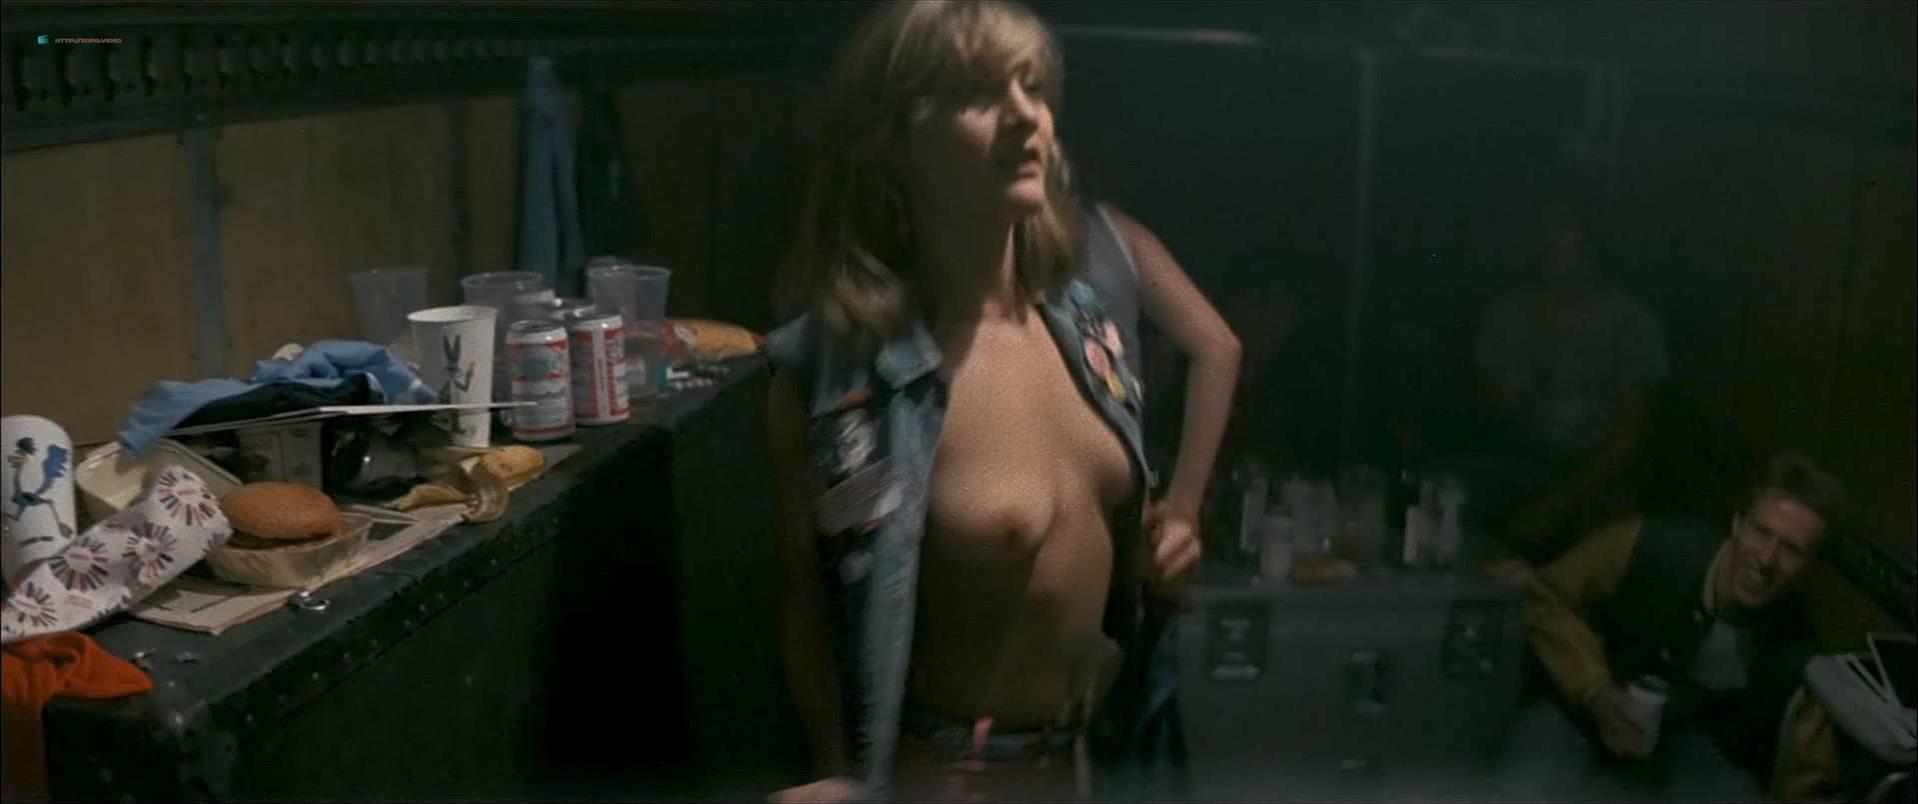 Jennifer Morrison Nude Boob Showing In Sexy Dress